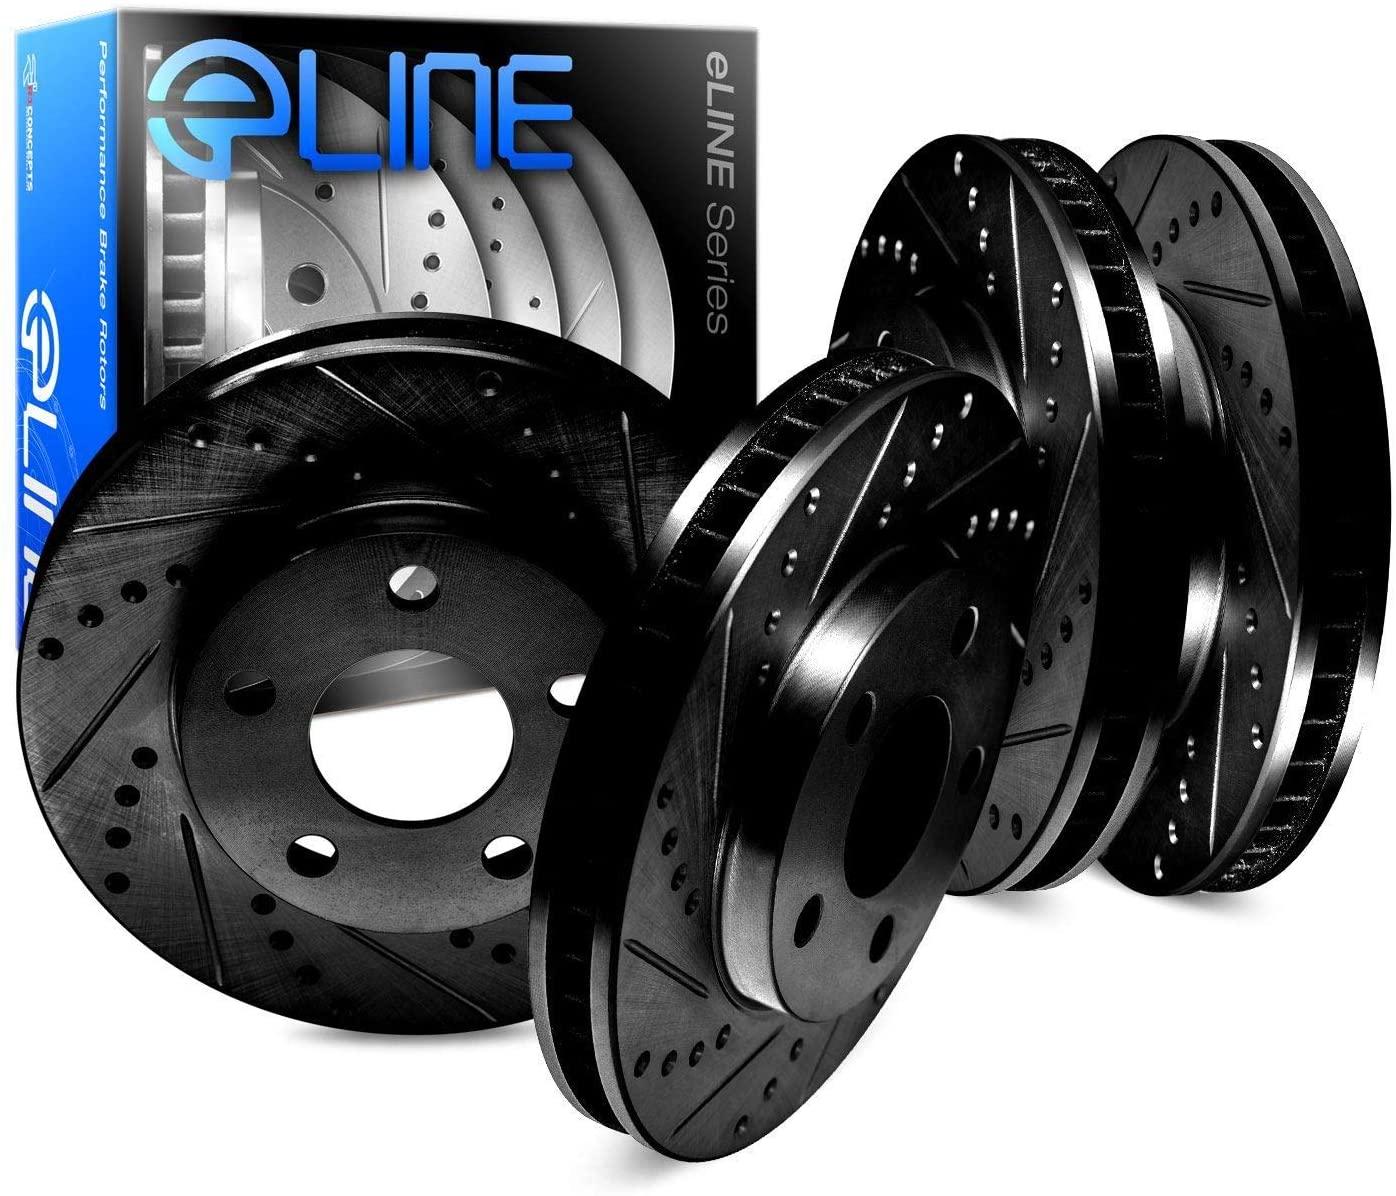 For 2004-2008 Chevrolet,Suzuki,Optra,Forenza,Reno R1 Concepts eLine Front Rear Black D/S Brake Rotors Kit